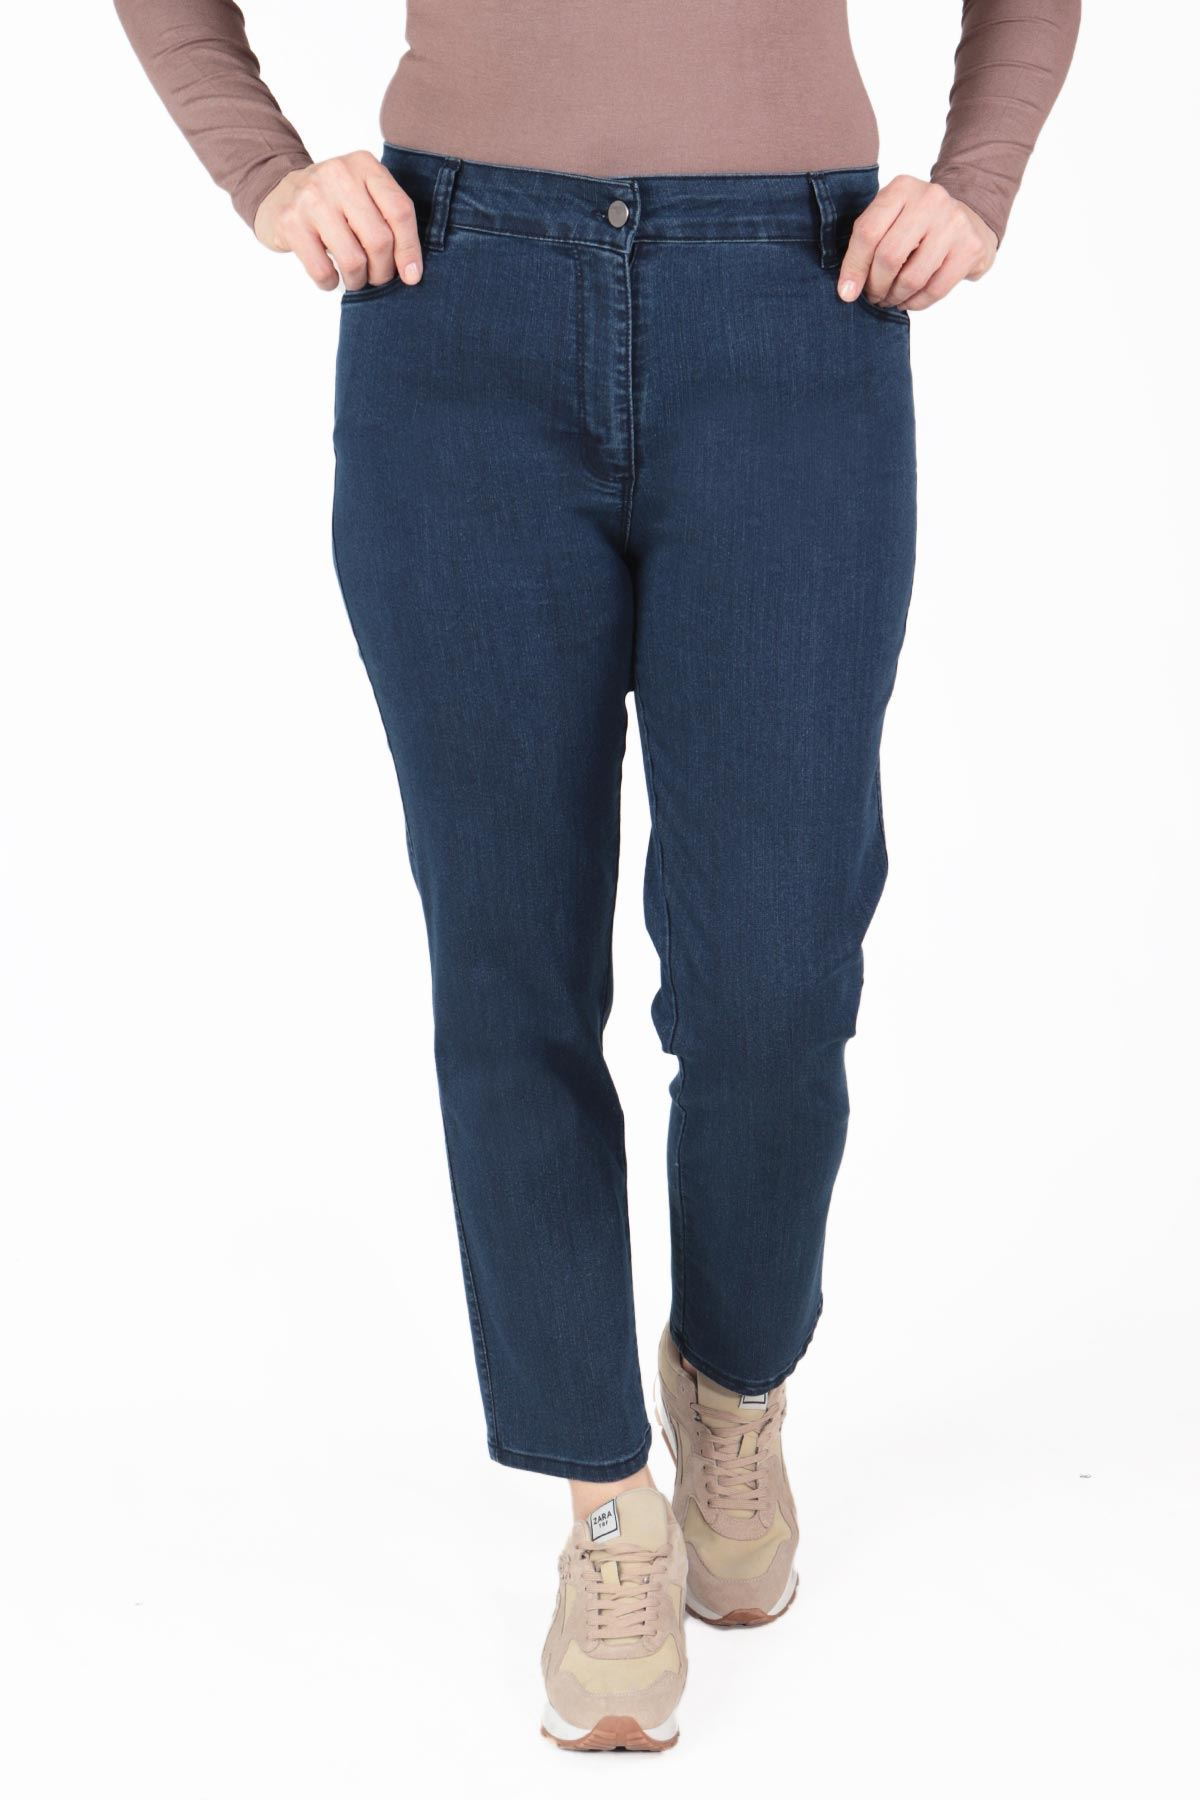 Büyük Beden Pantolon Mavi B643